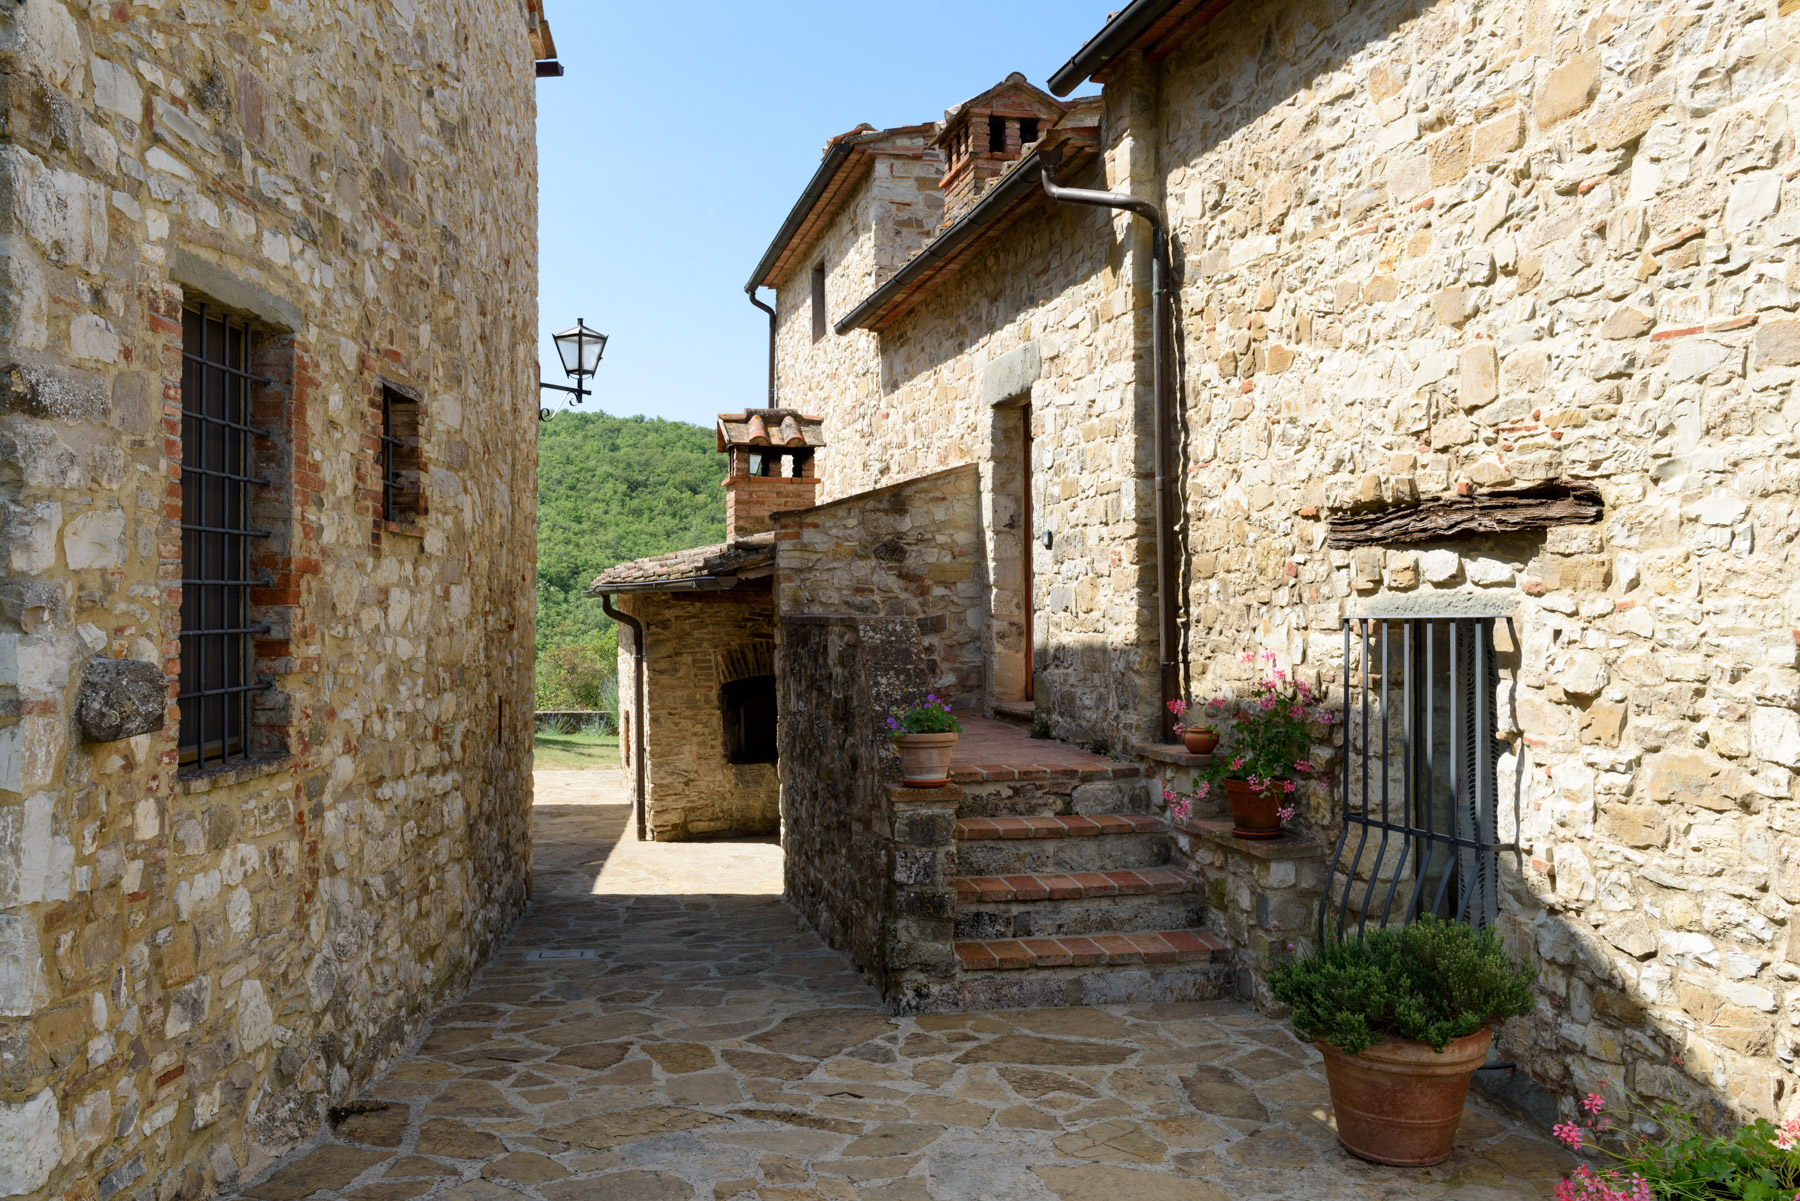 Rustico in Vendita a Castellina In Chianti: 5 locali, 650 mq - Foto 6